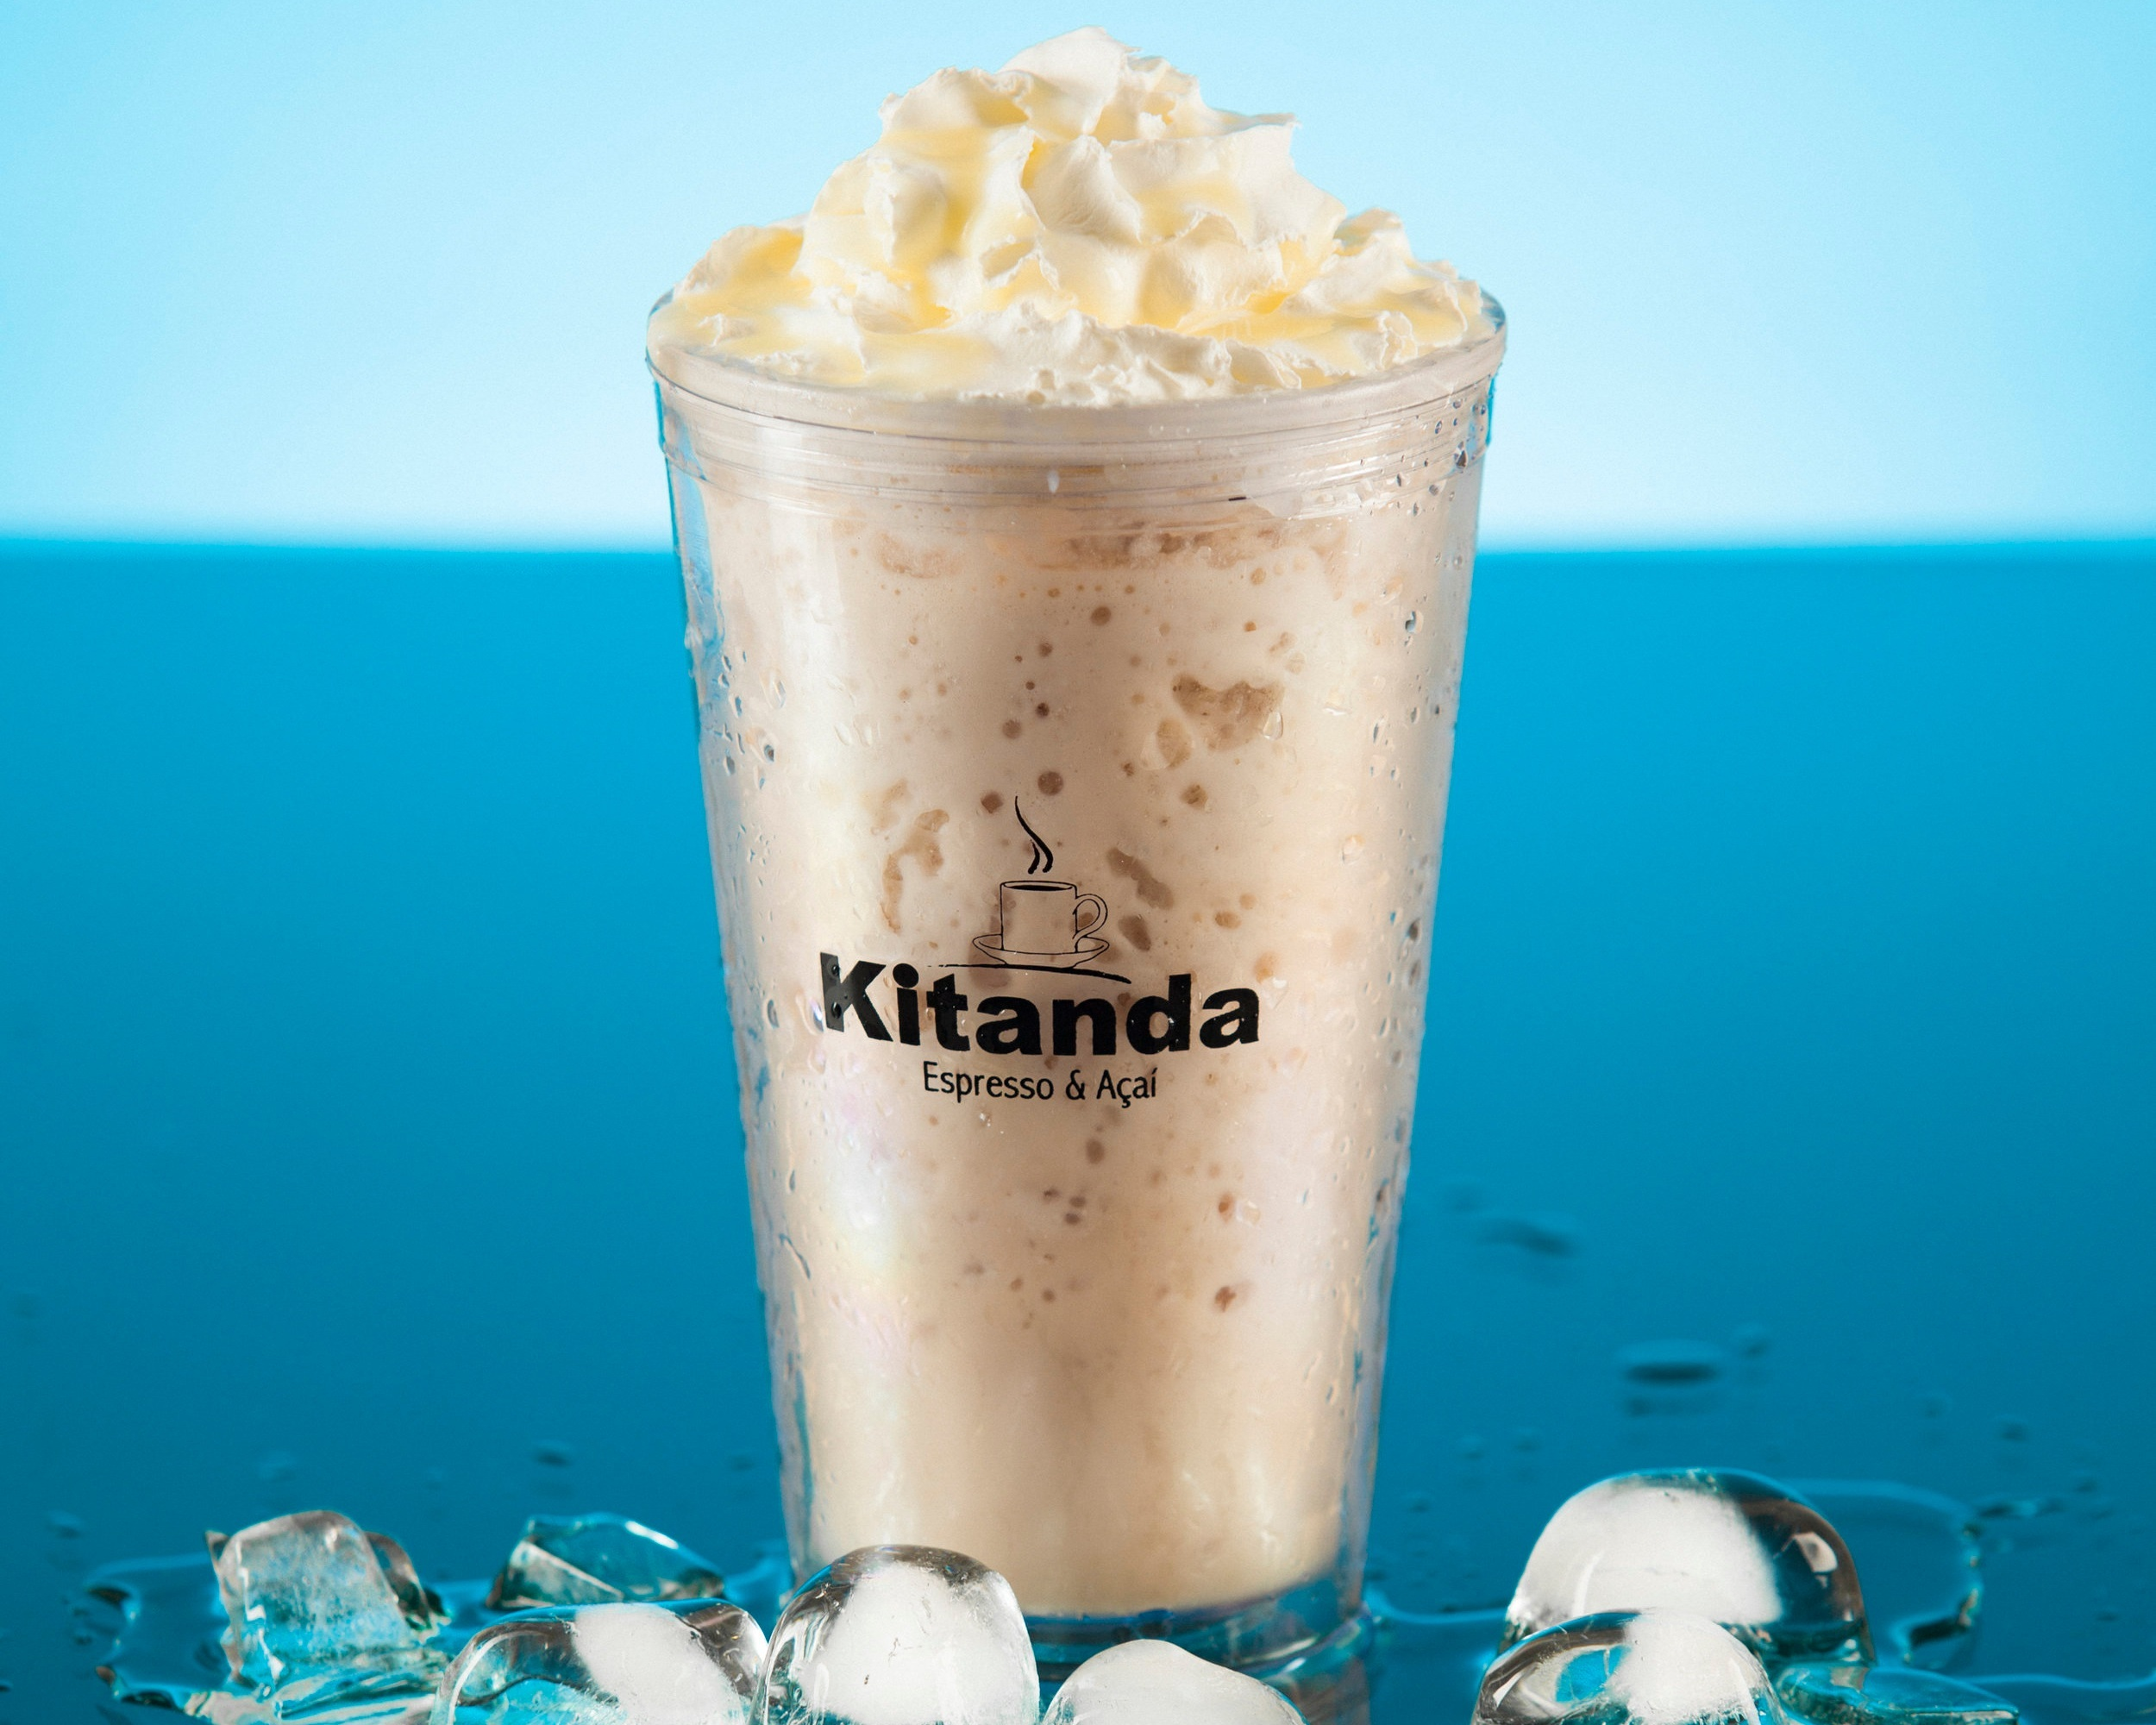 20140526_Kitanda_Coffee_5D2_MG_9367.jpg